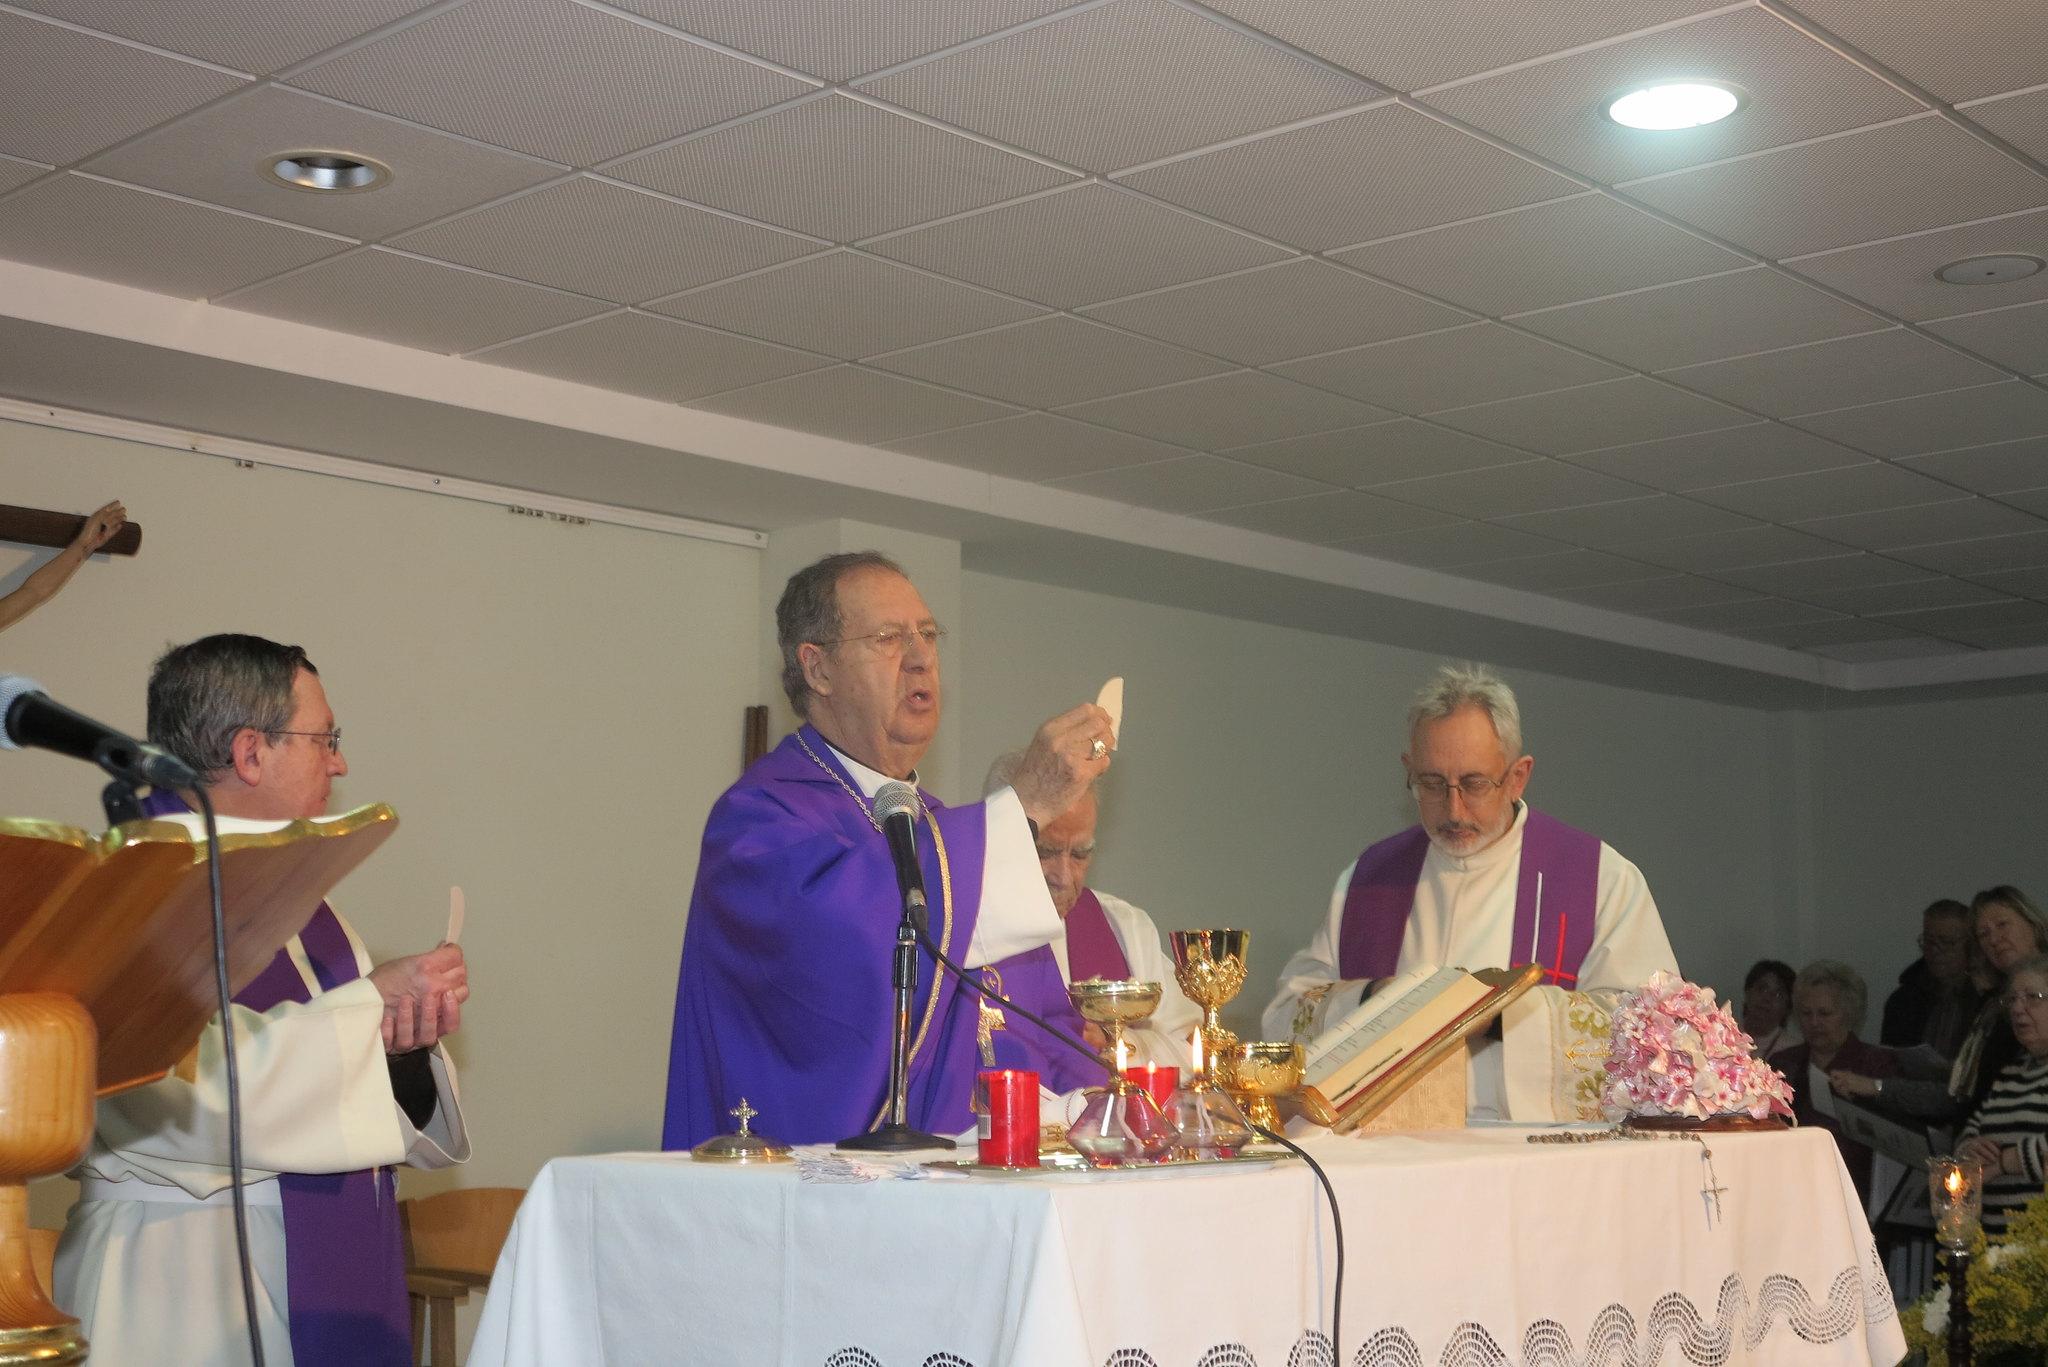 (2016-02-13) - Inauguración Virgen de Lourdes, La Molineta - Archivo La Molineta 2 (35)